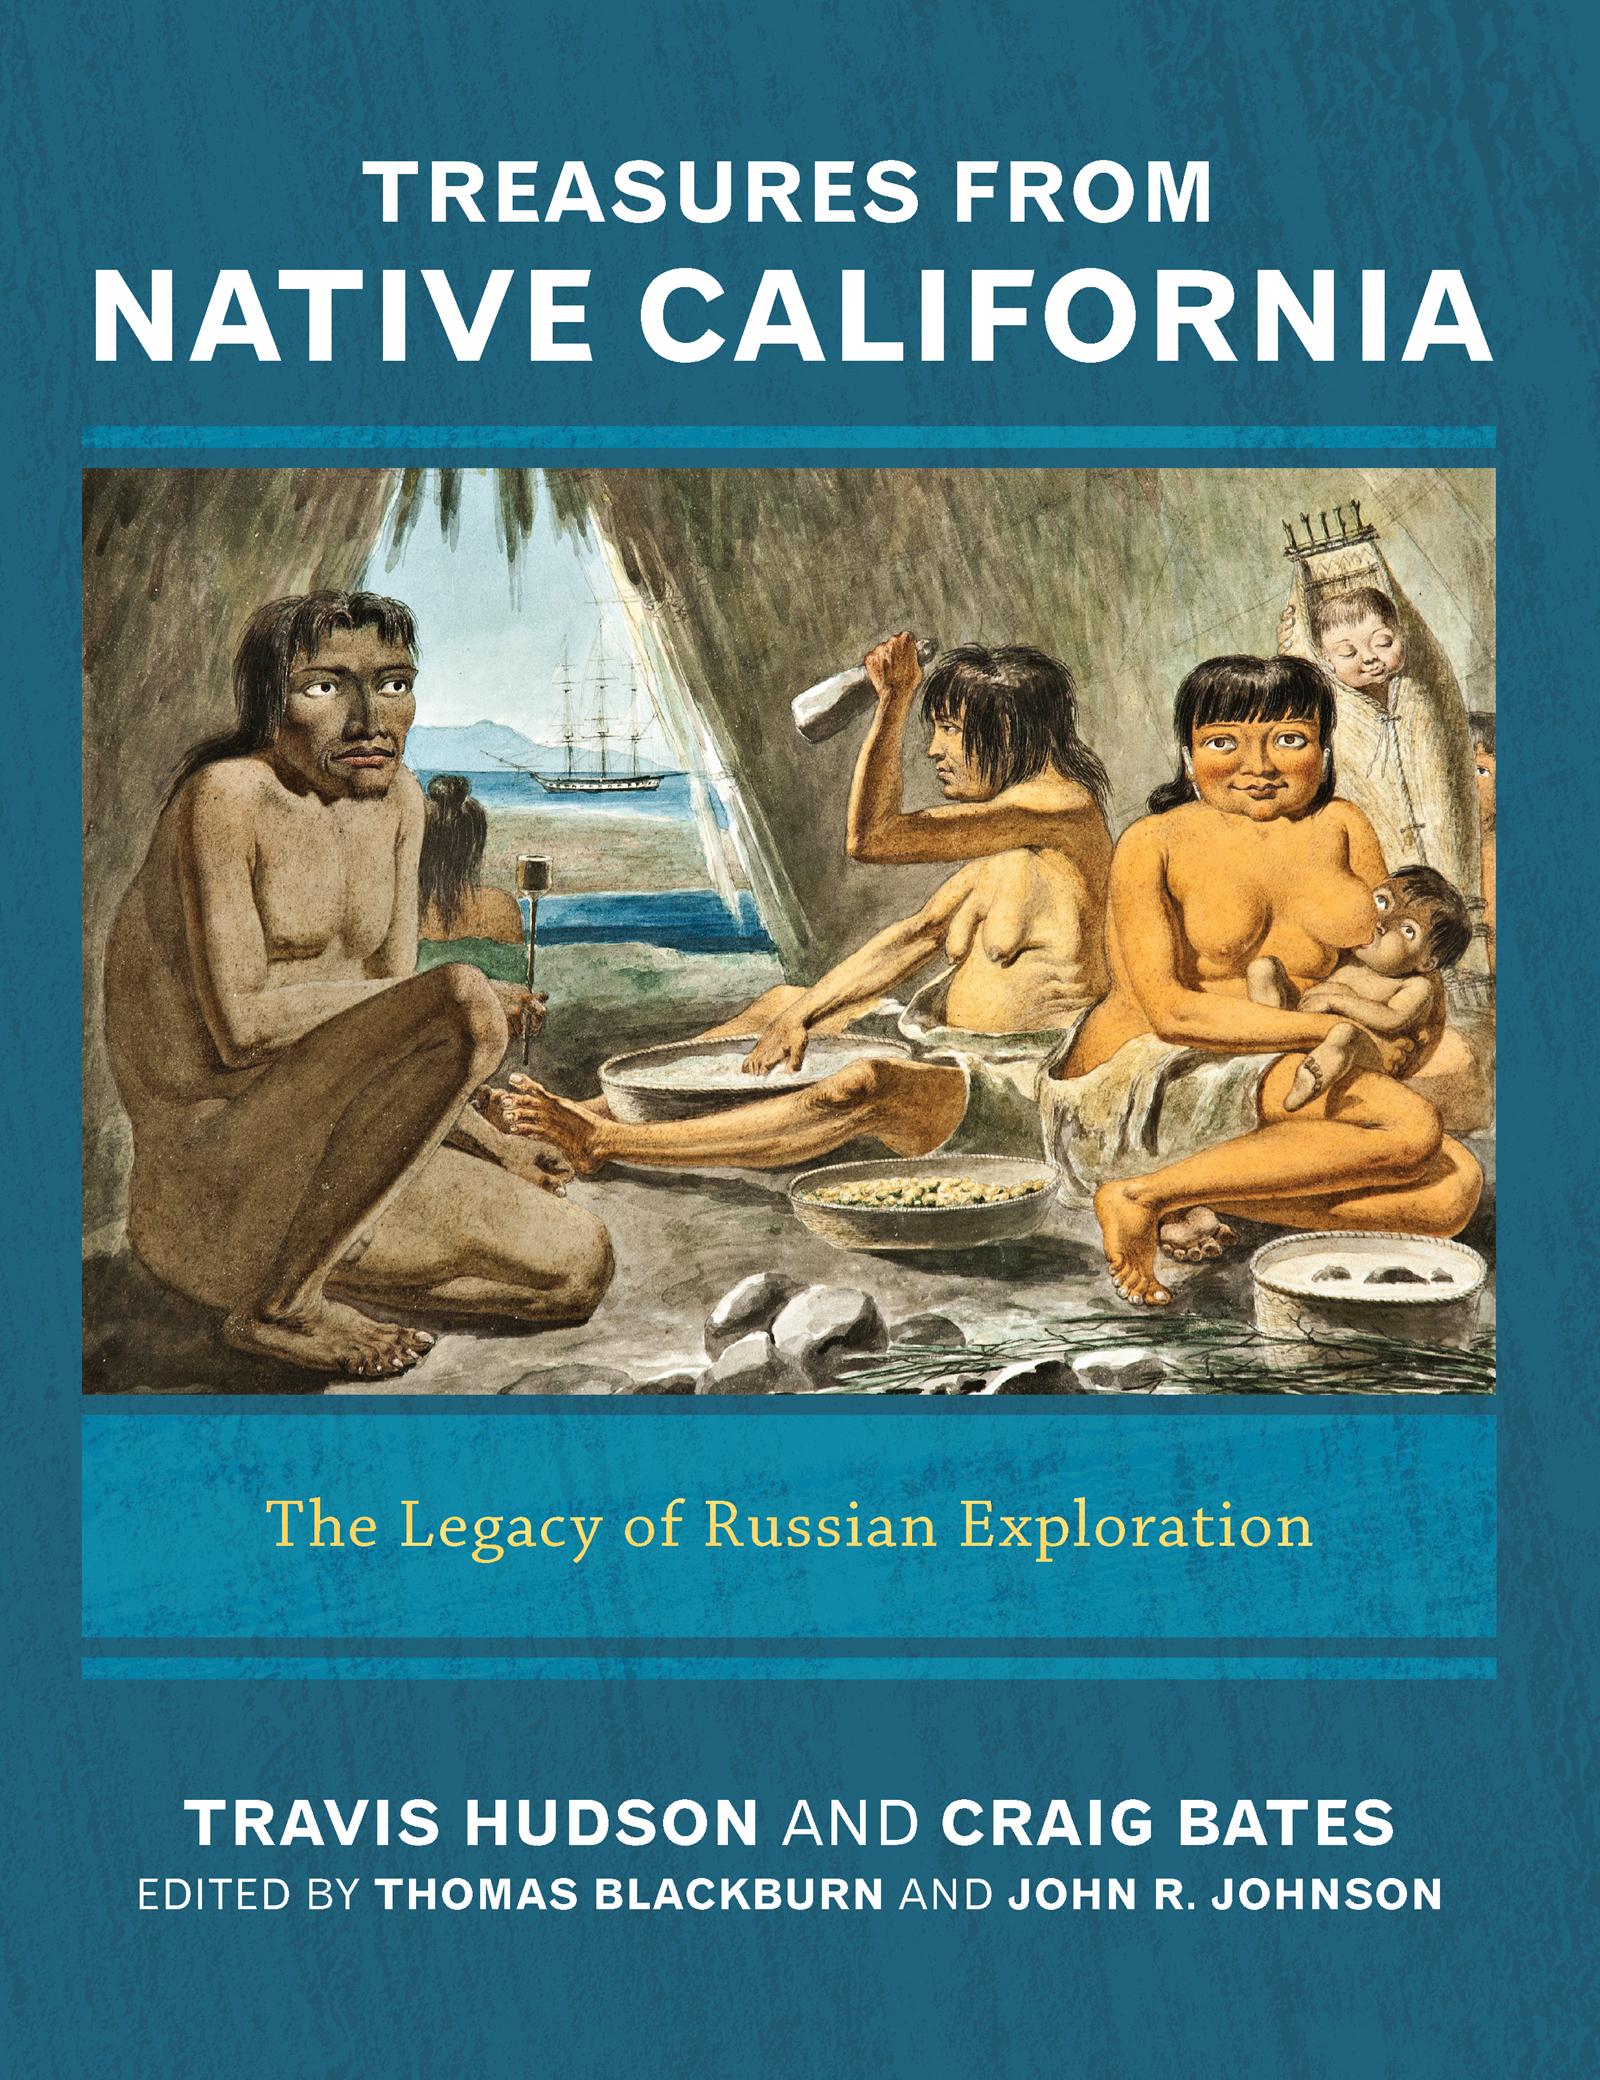 Treasures from Native California